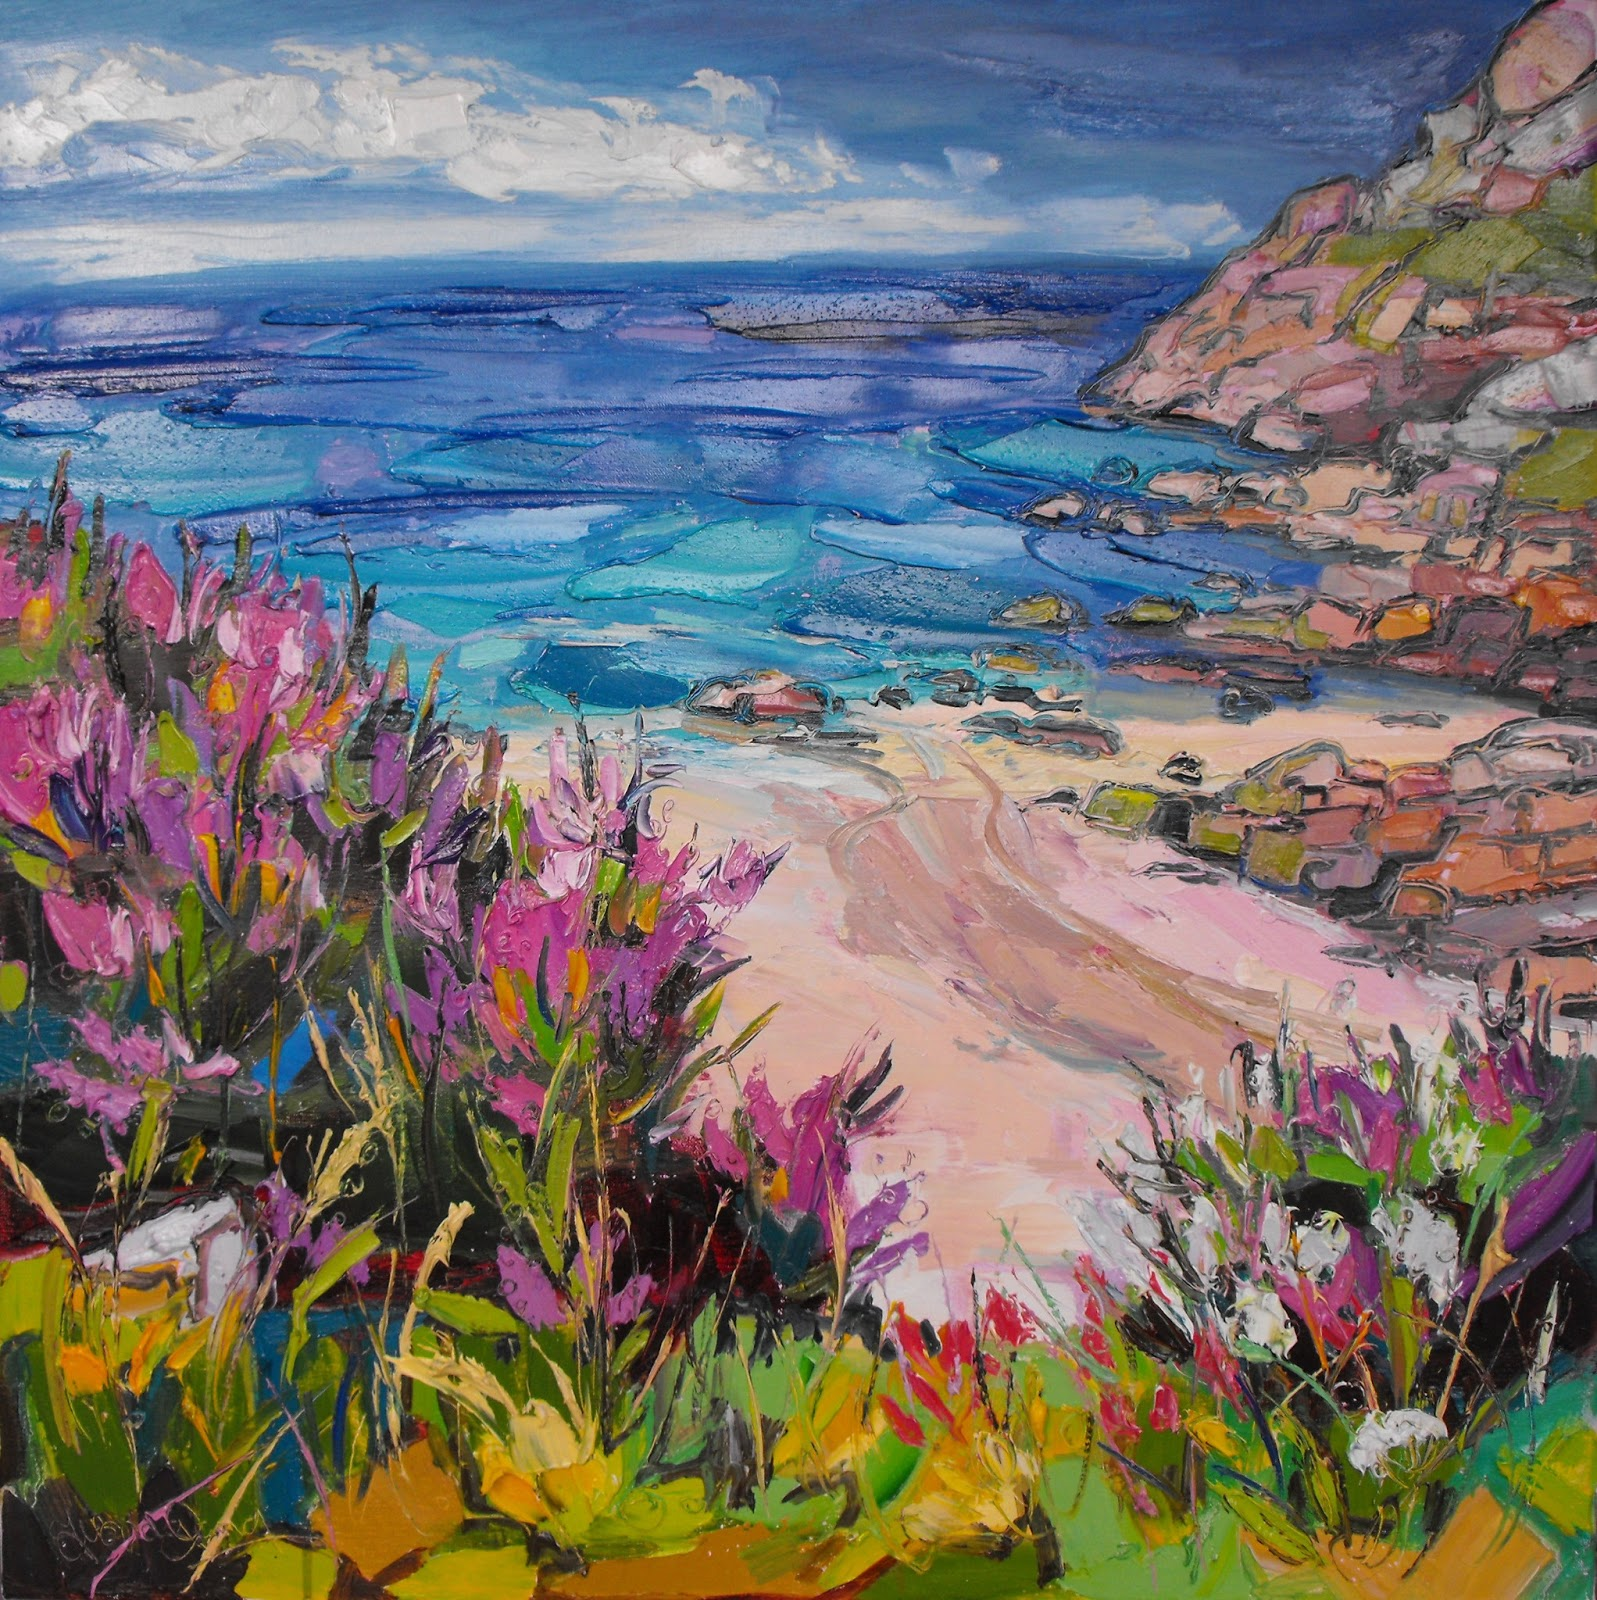 Clip Art: Basic Words: -ove Phonics: Cove Color I abcteach ... |Painting Artist Directory Cove